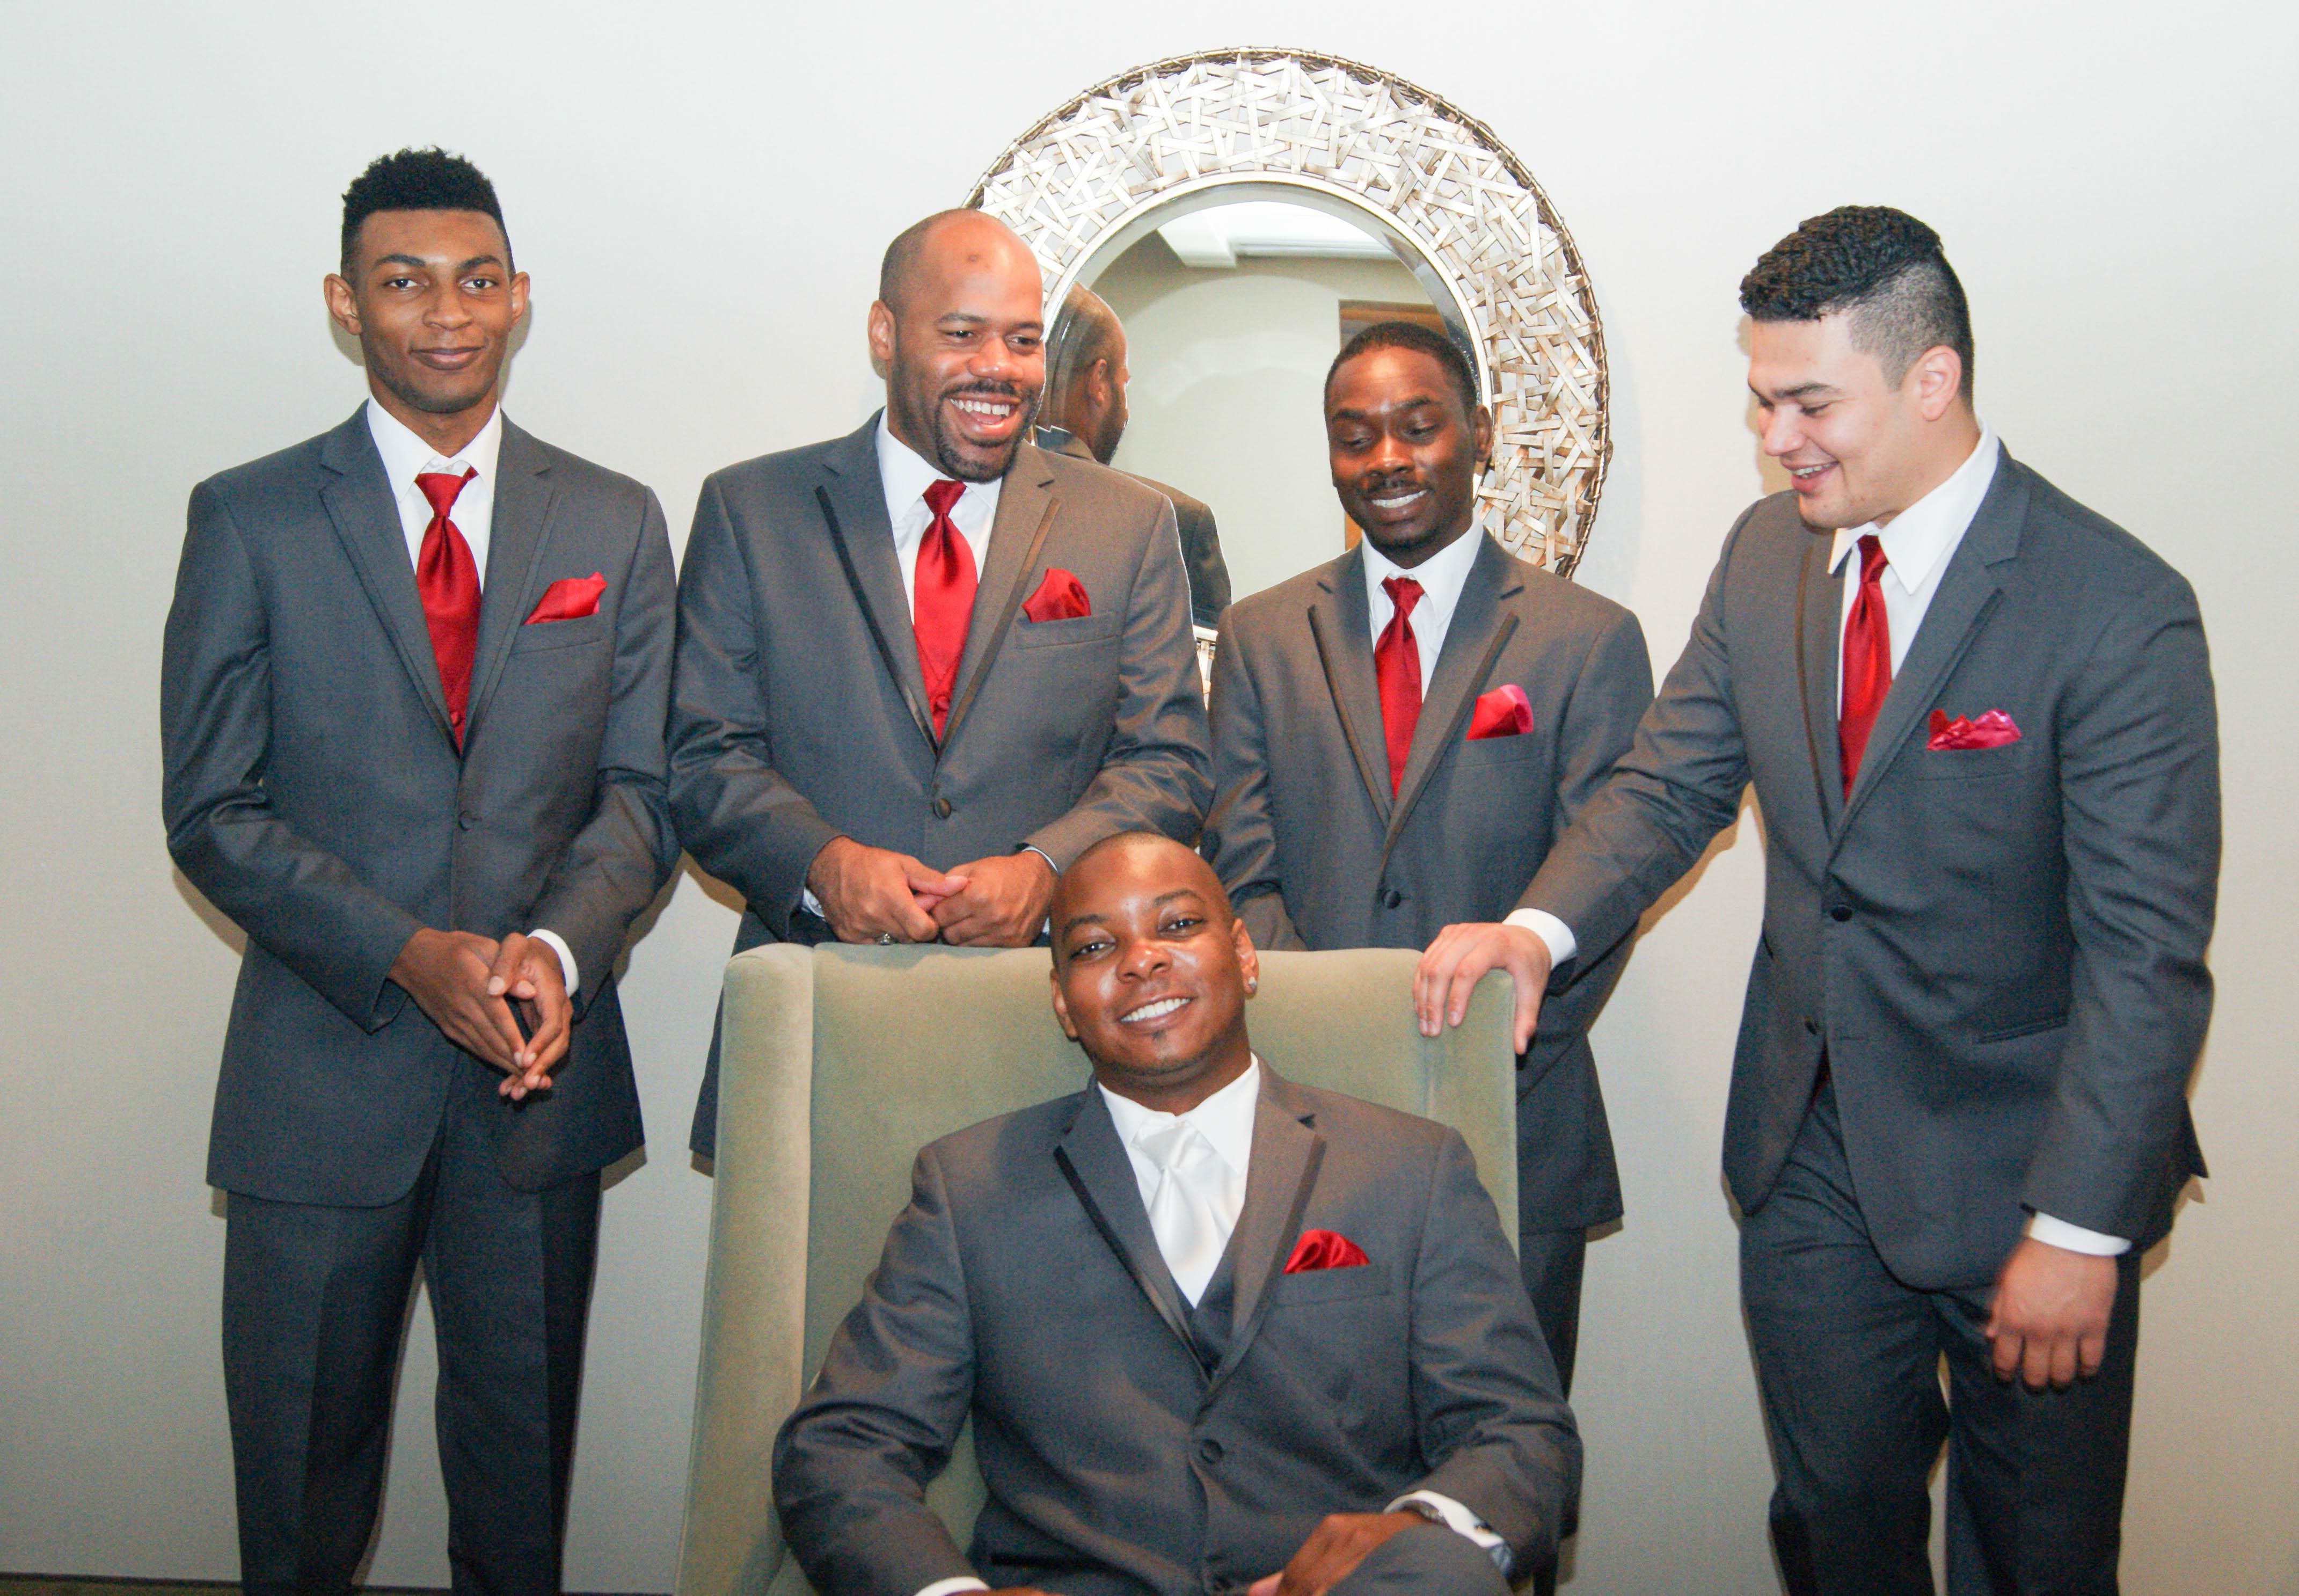 CPH_High-Res-Gaither Wedding2018-15